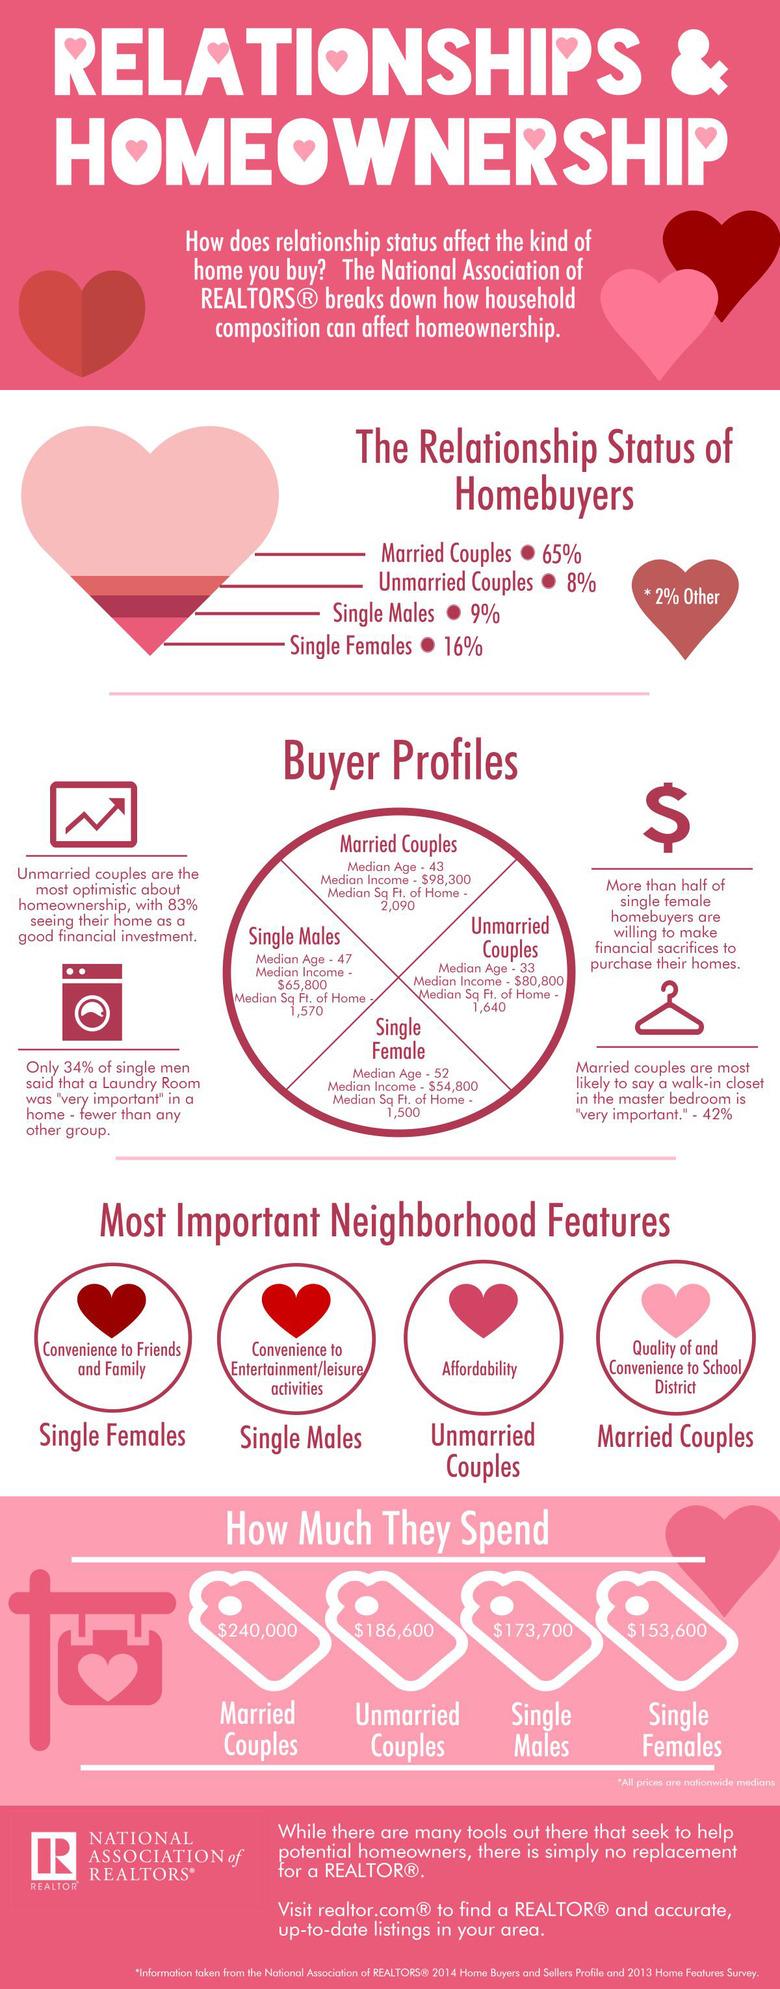 NAR-2014-relationships-and-homeownership-infogrpahic.jpg